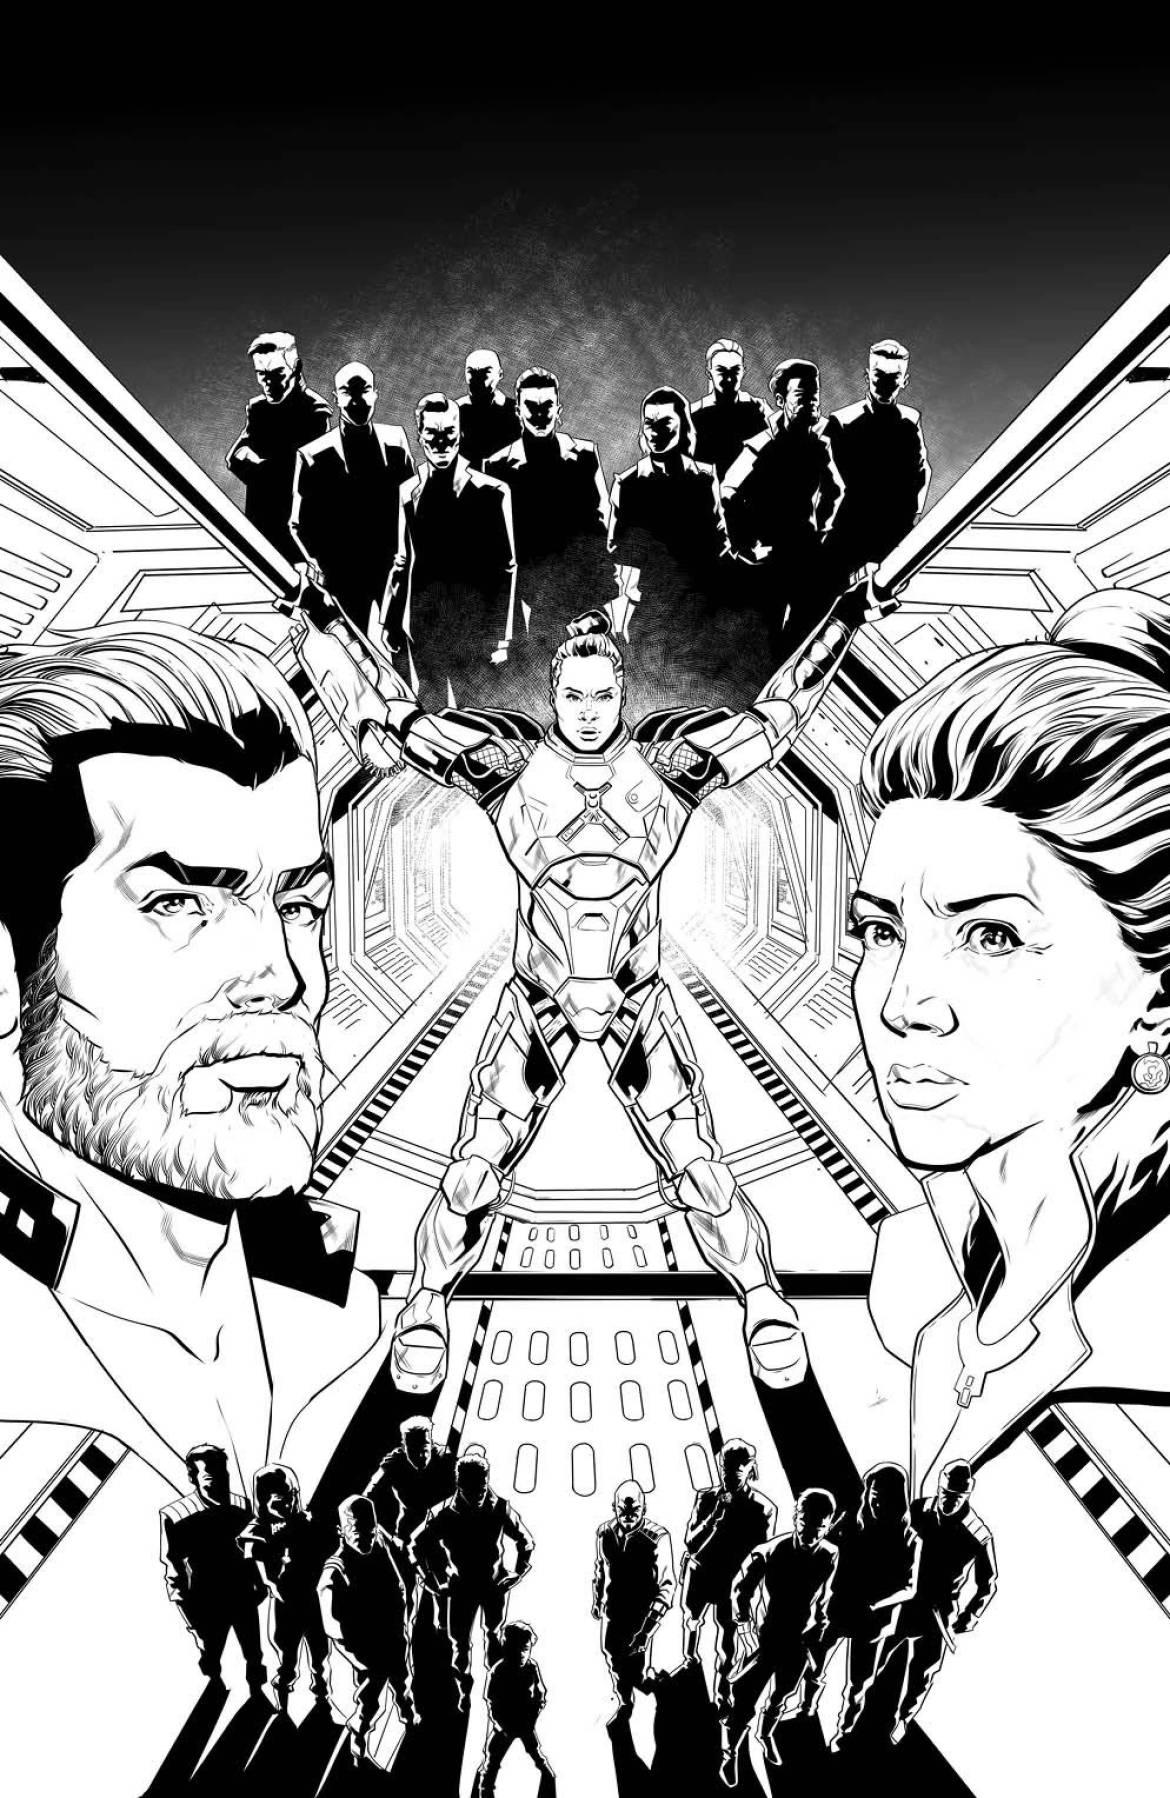 STL180018 ComicList: BOOM! Studios New Releases for 03/17/2021